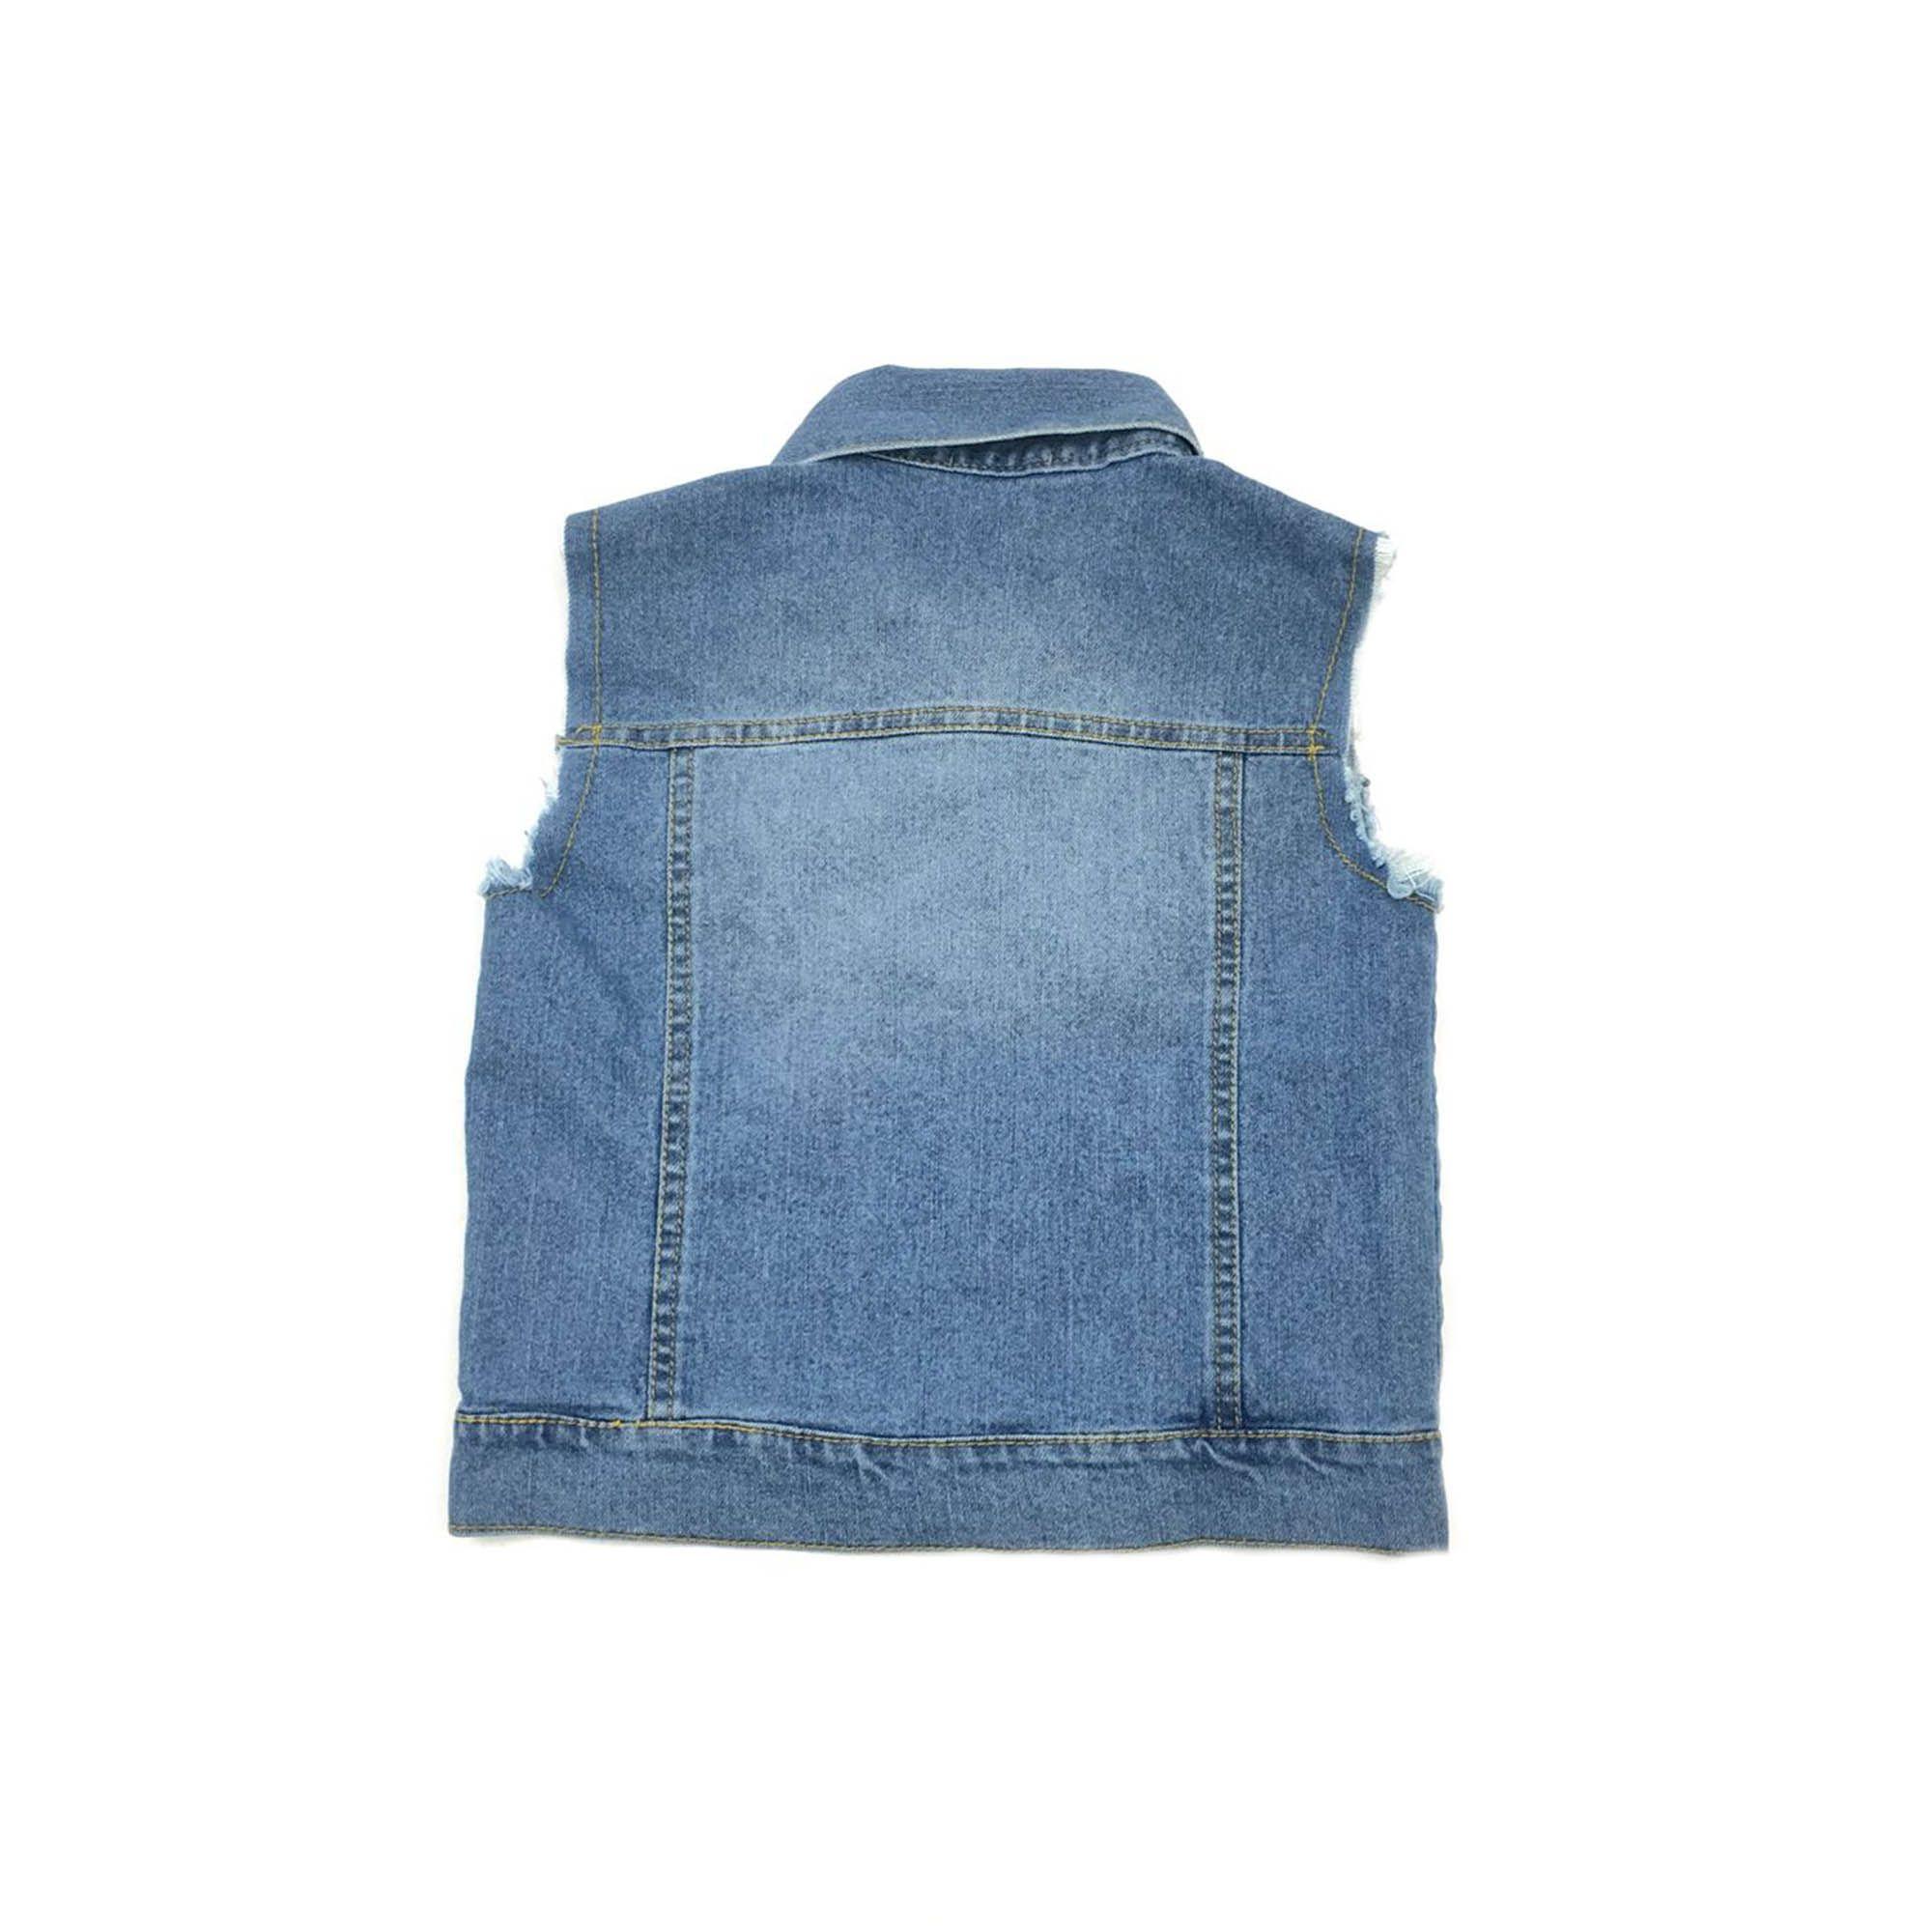 Colete Jeans Bambollina 10892